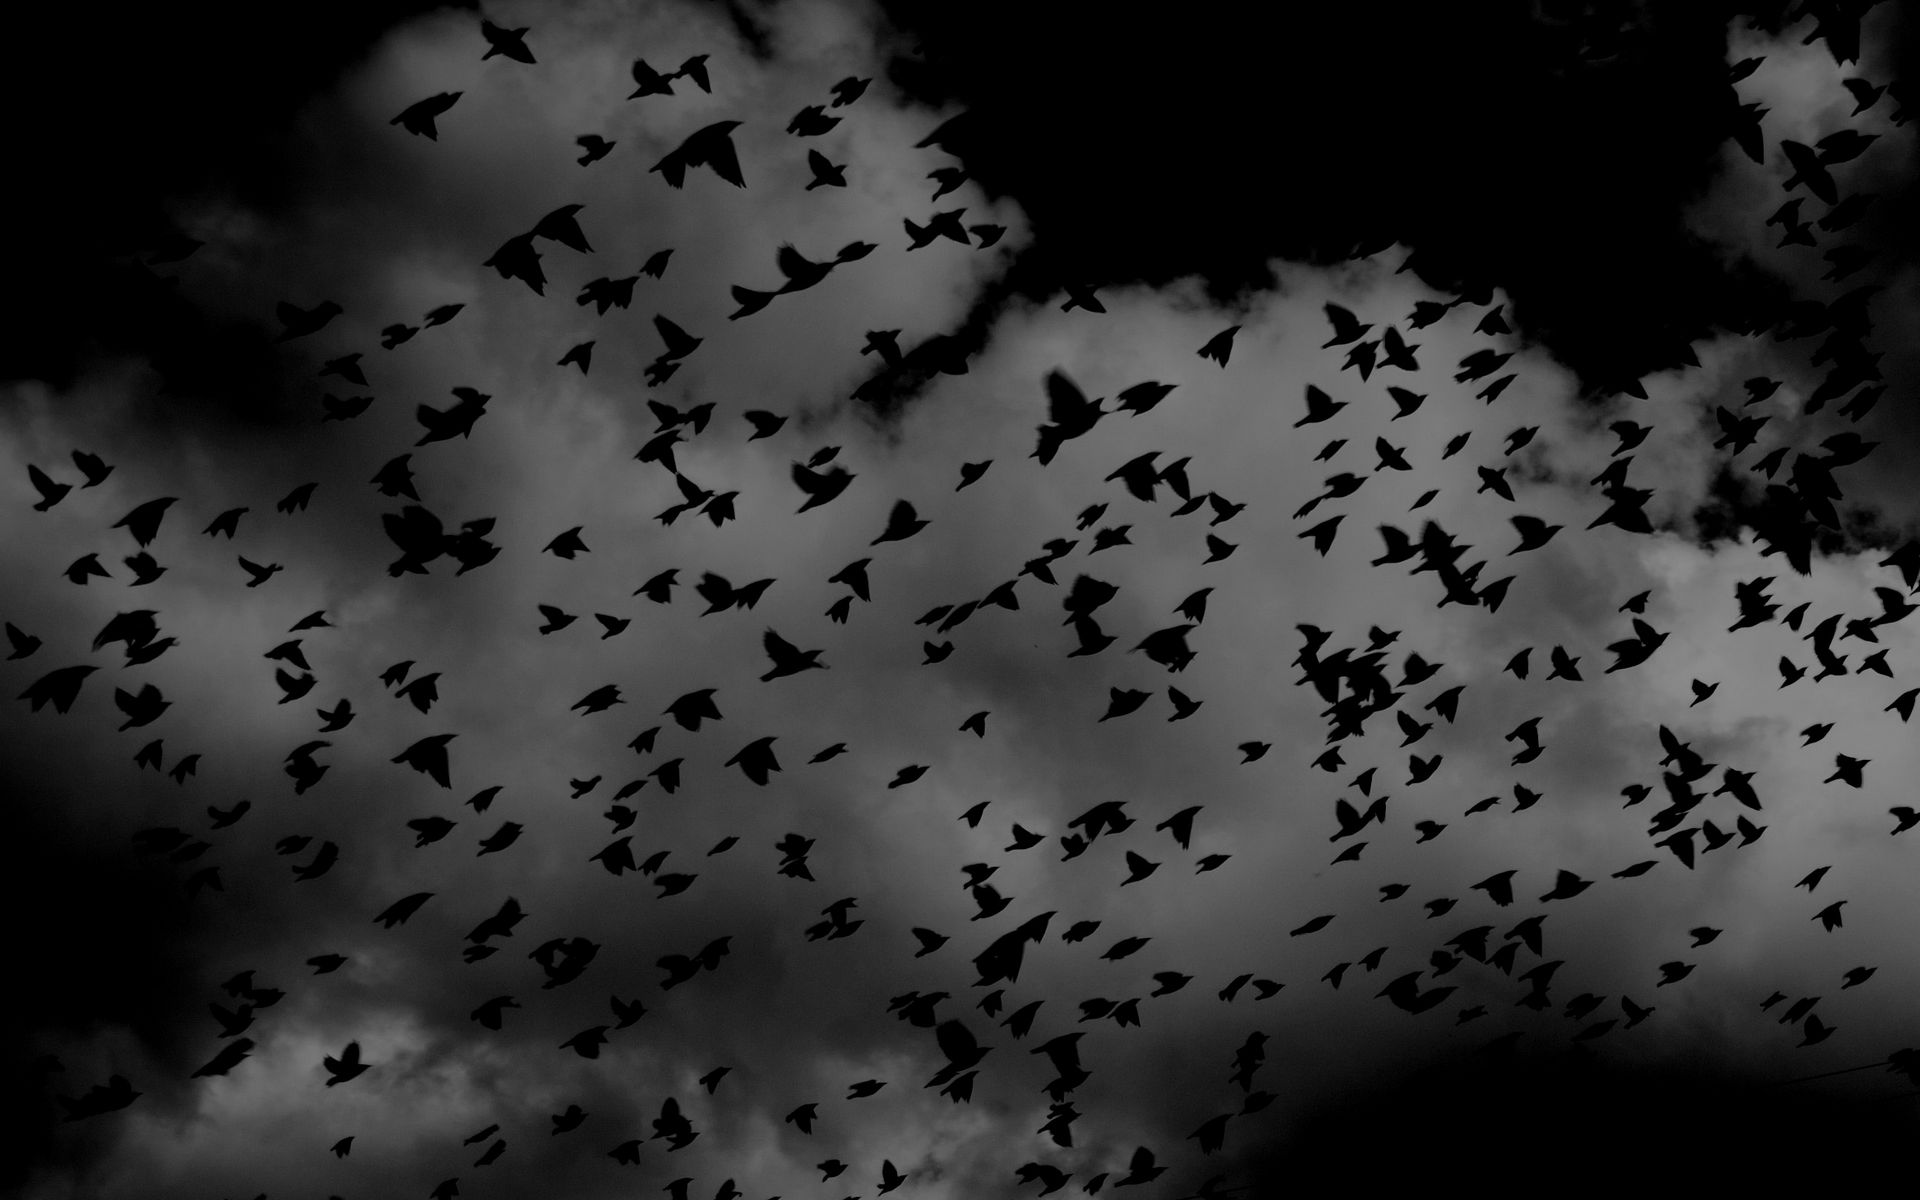 1920x1200 Wallpaper birds, flock, dark, clouds, sky